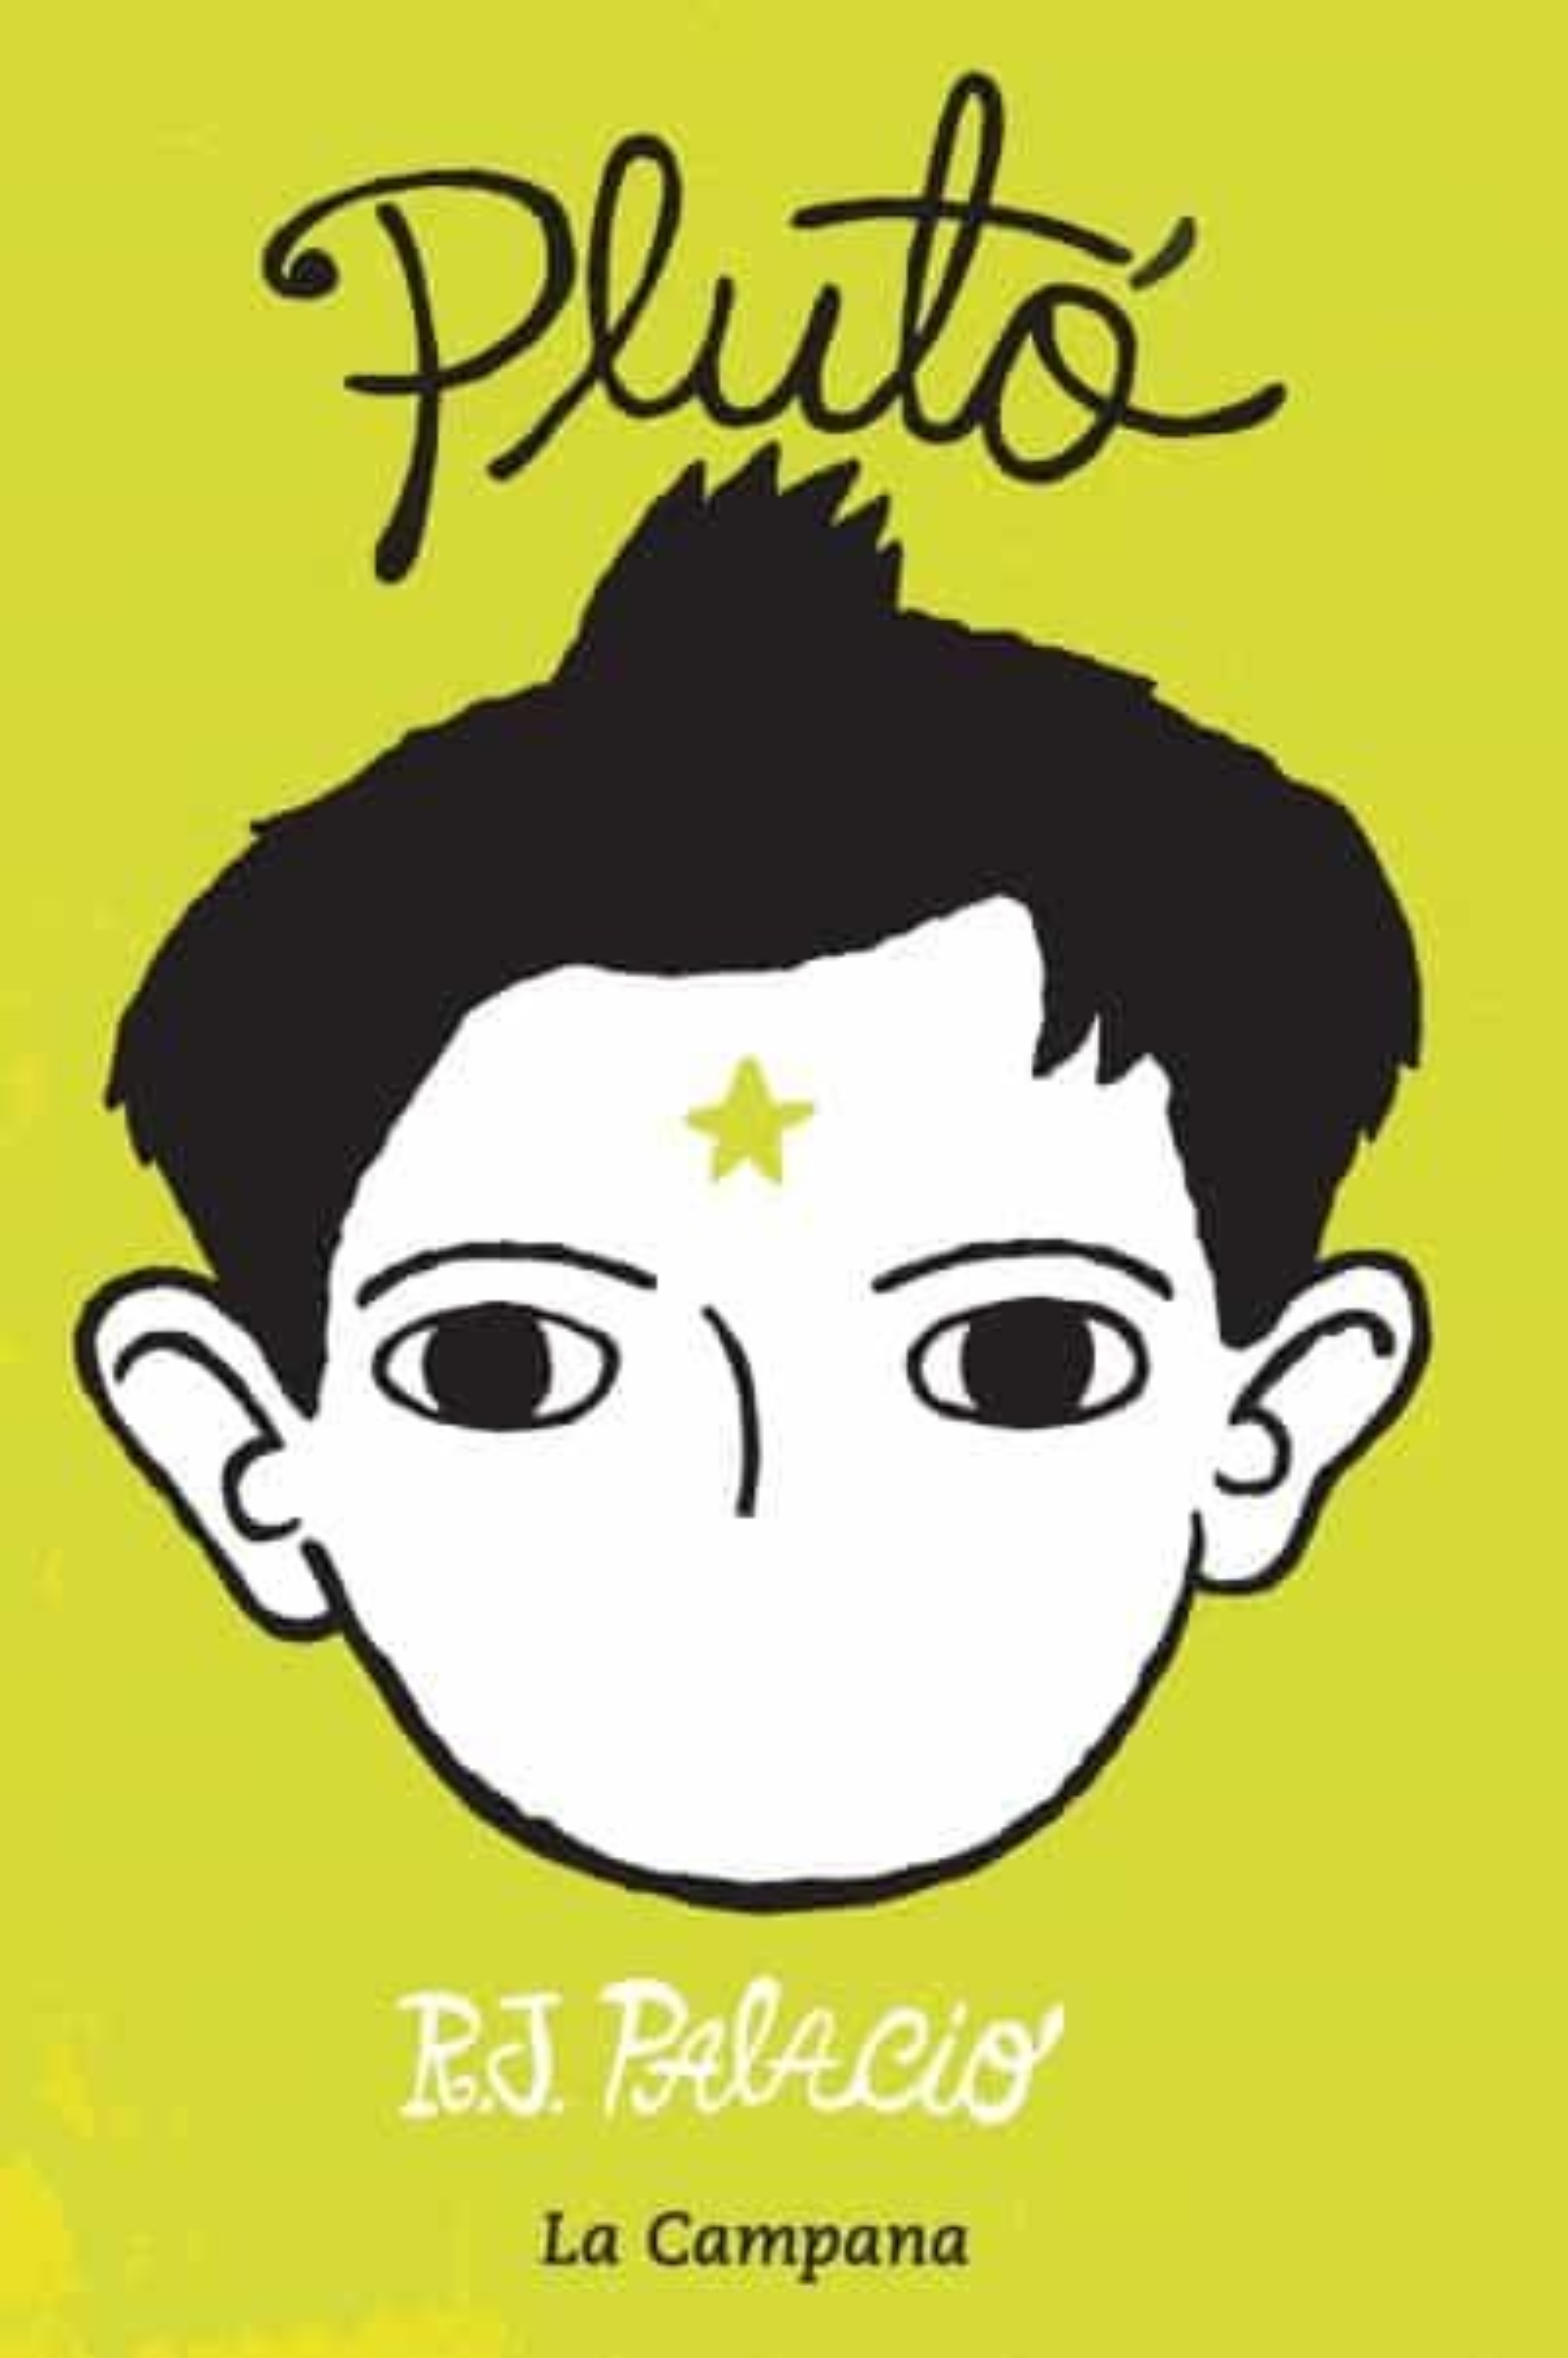 Pluto (català) - Palacio R.j.